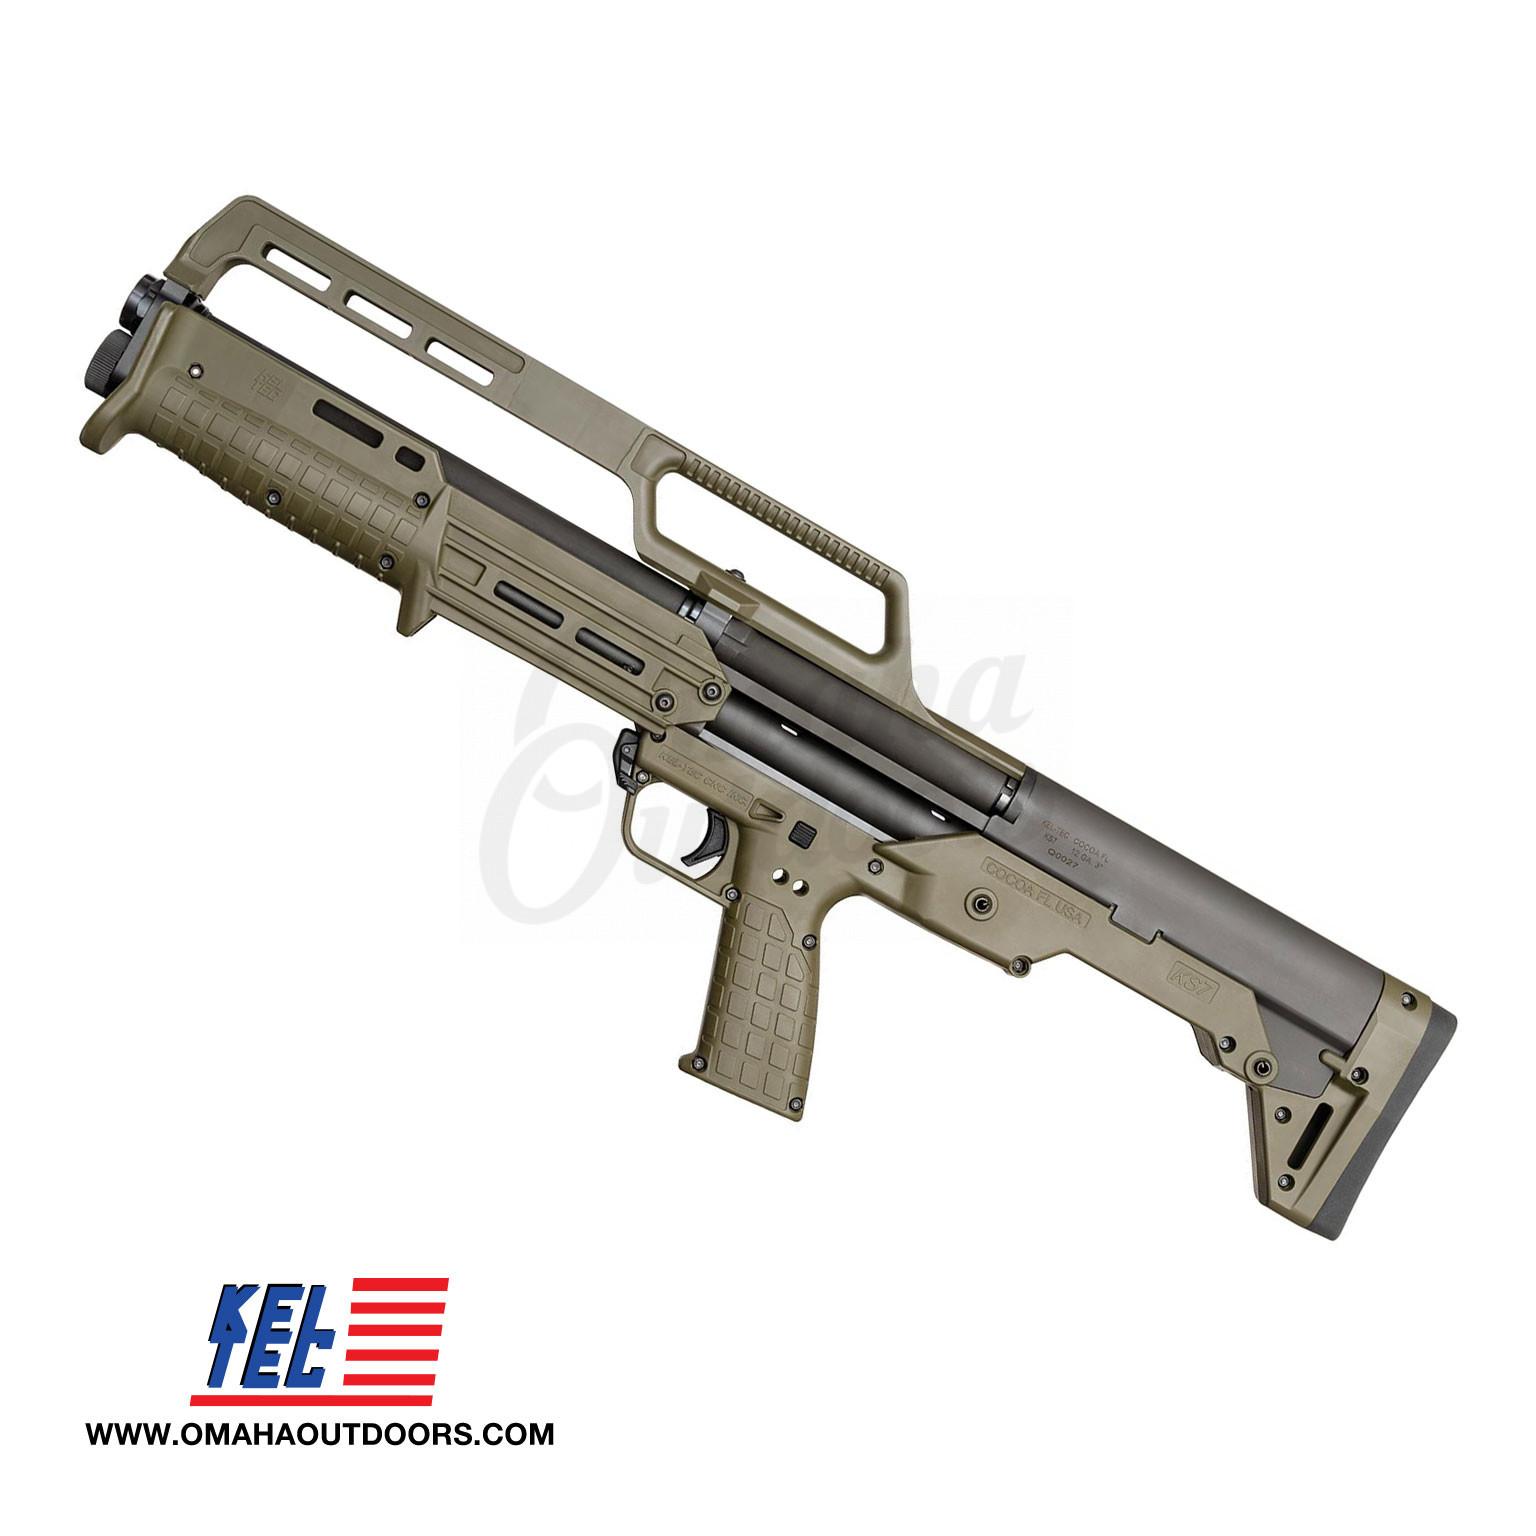 Kel-Tec KS7 Pump Shotgun 12 Gauge 6 RD 18 5″ Green Synthetic Stock KS7GRN